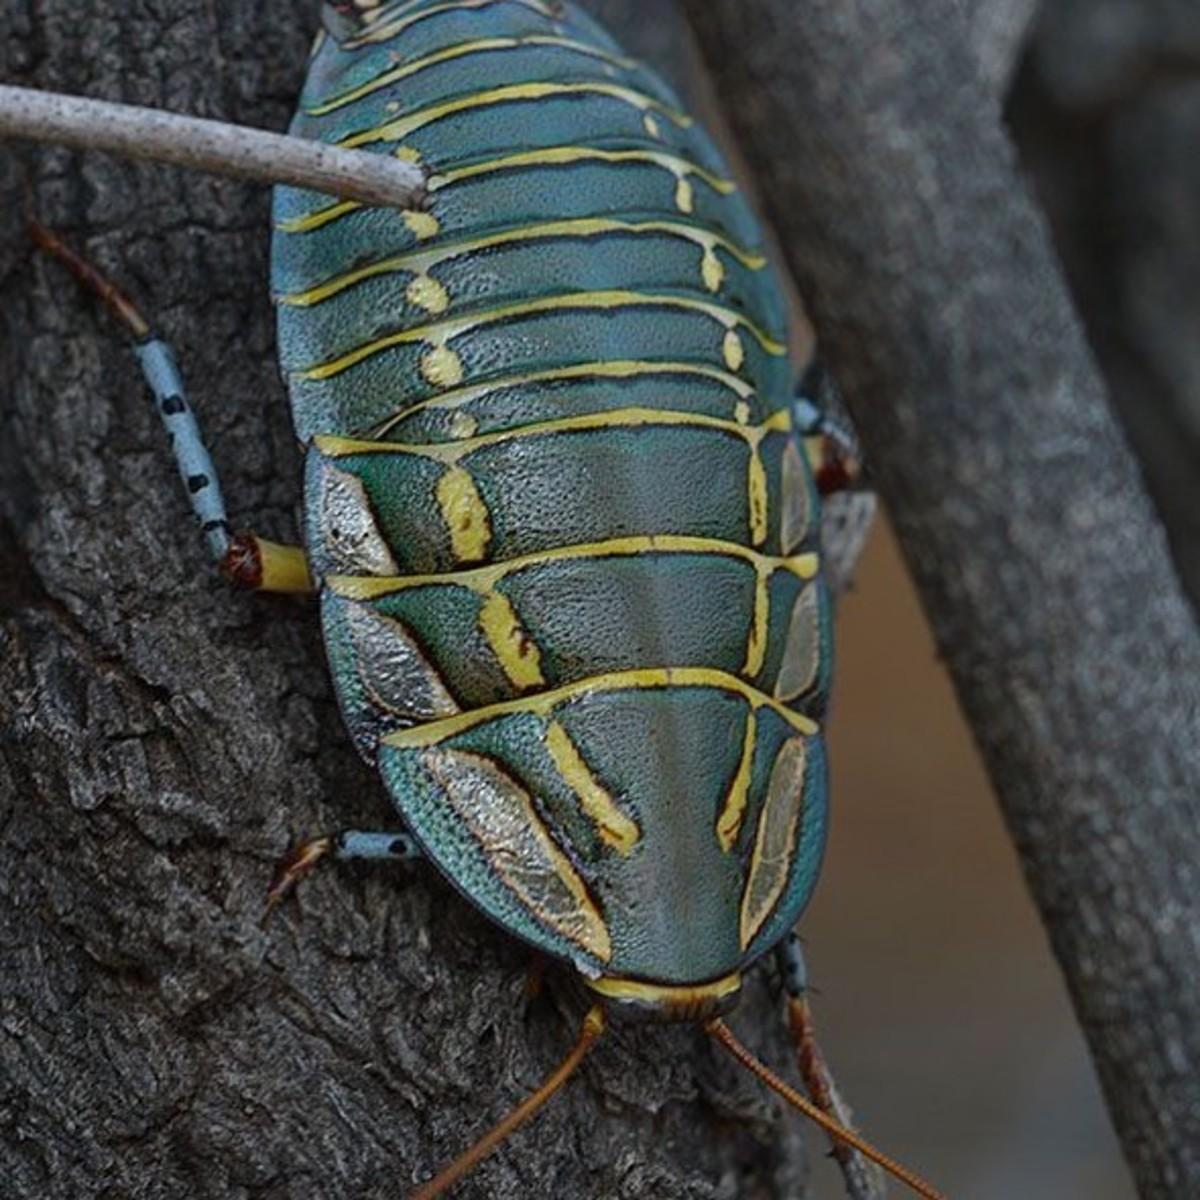 Female Painted Trilobite Cockroach